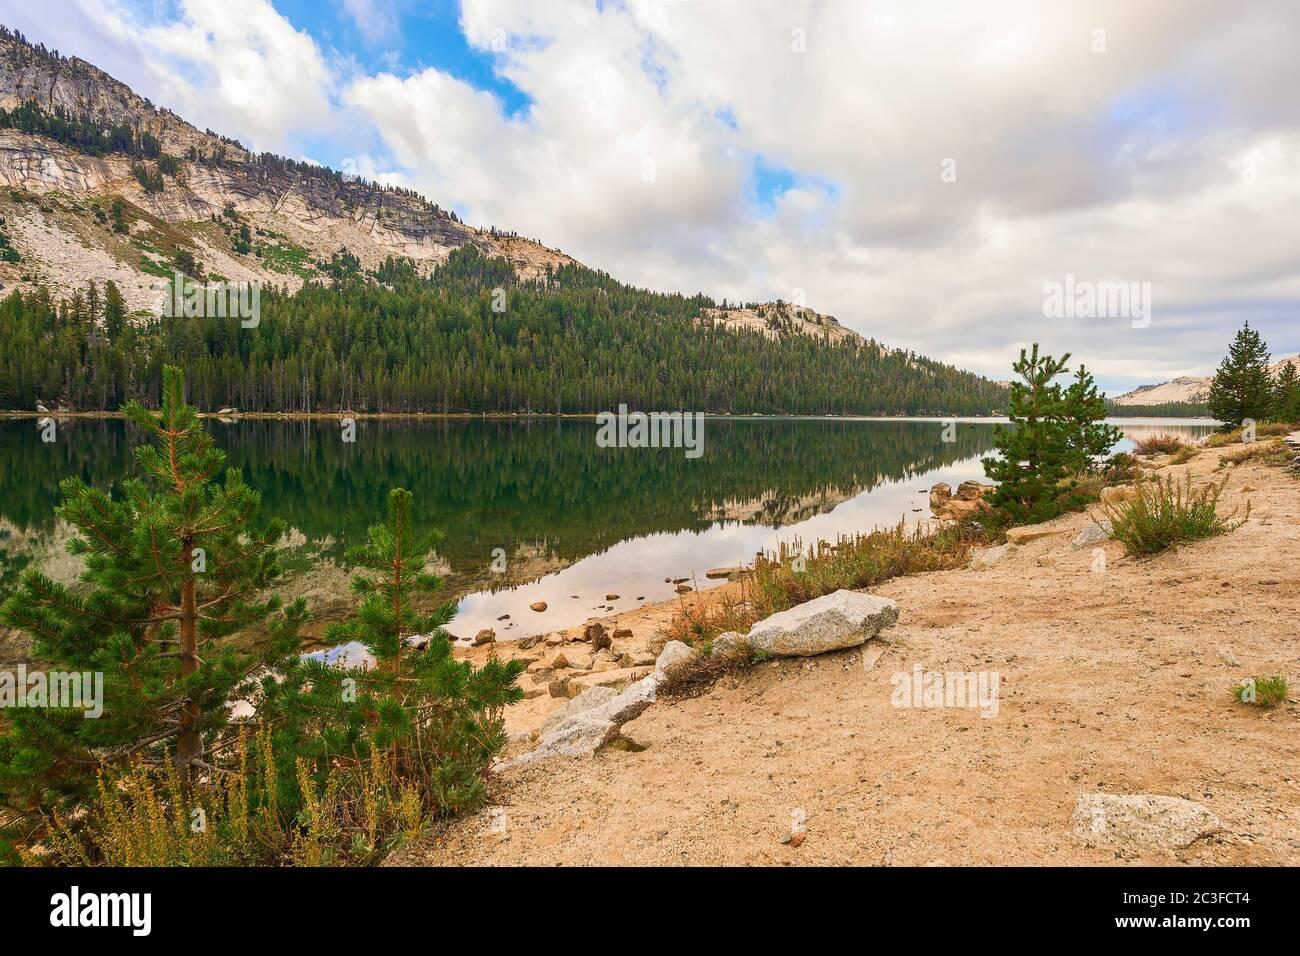 View of alpine Tenaya lake in Yosemite National Park. California.USA Stock Photo